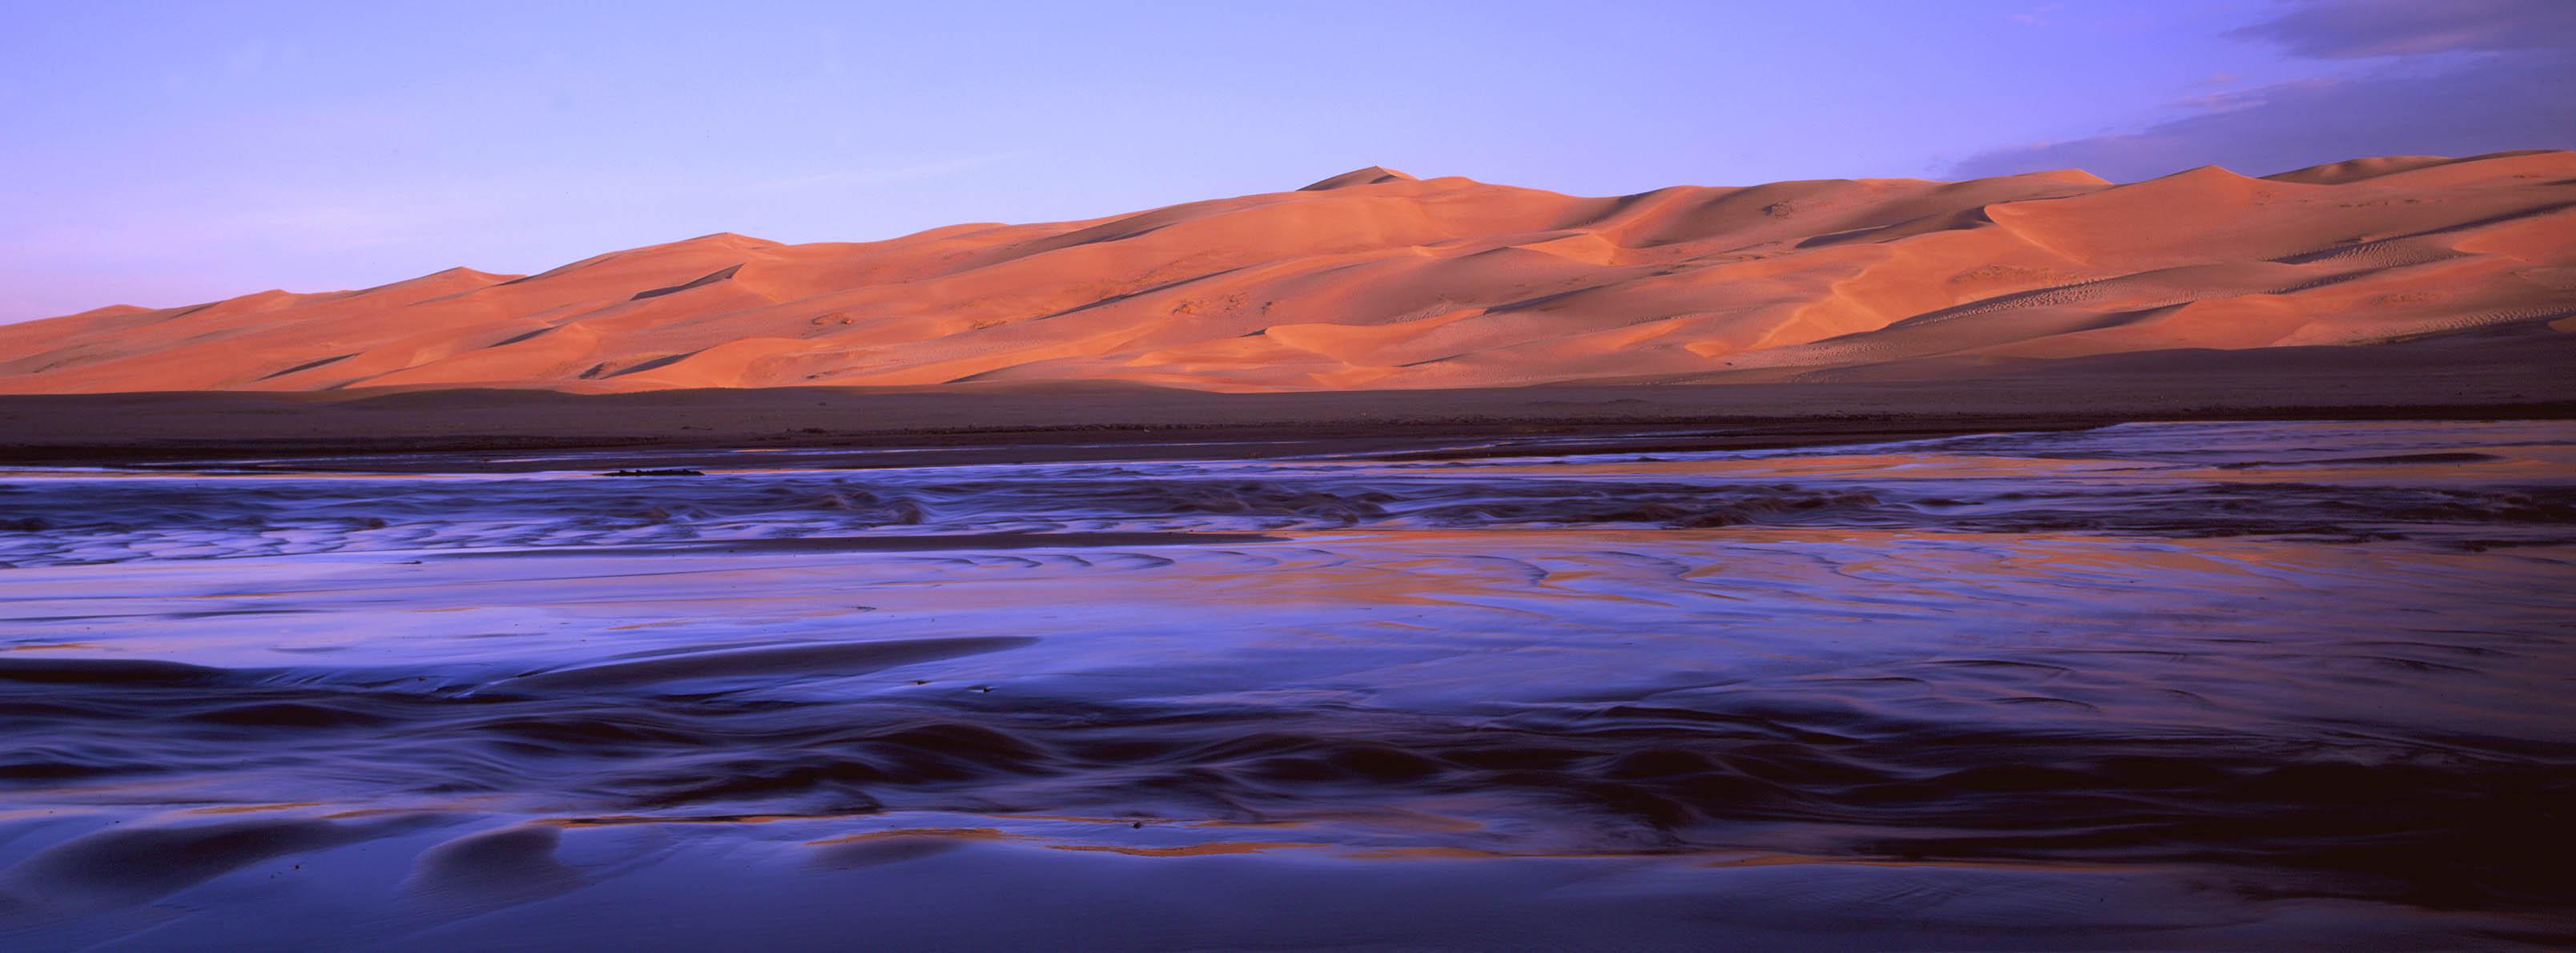 Sand_dunes_H